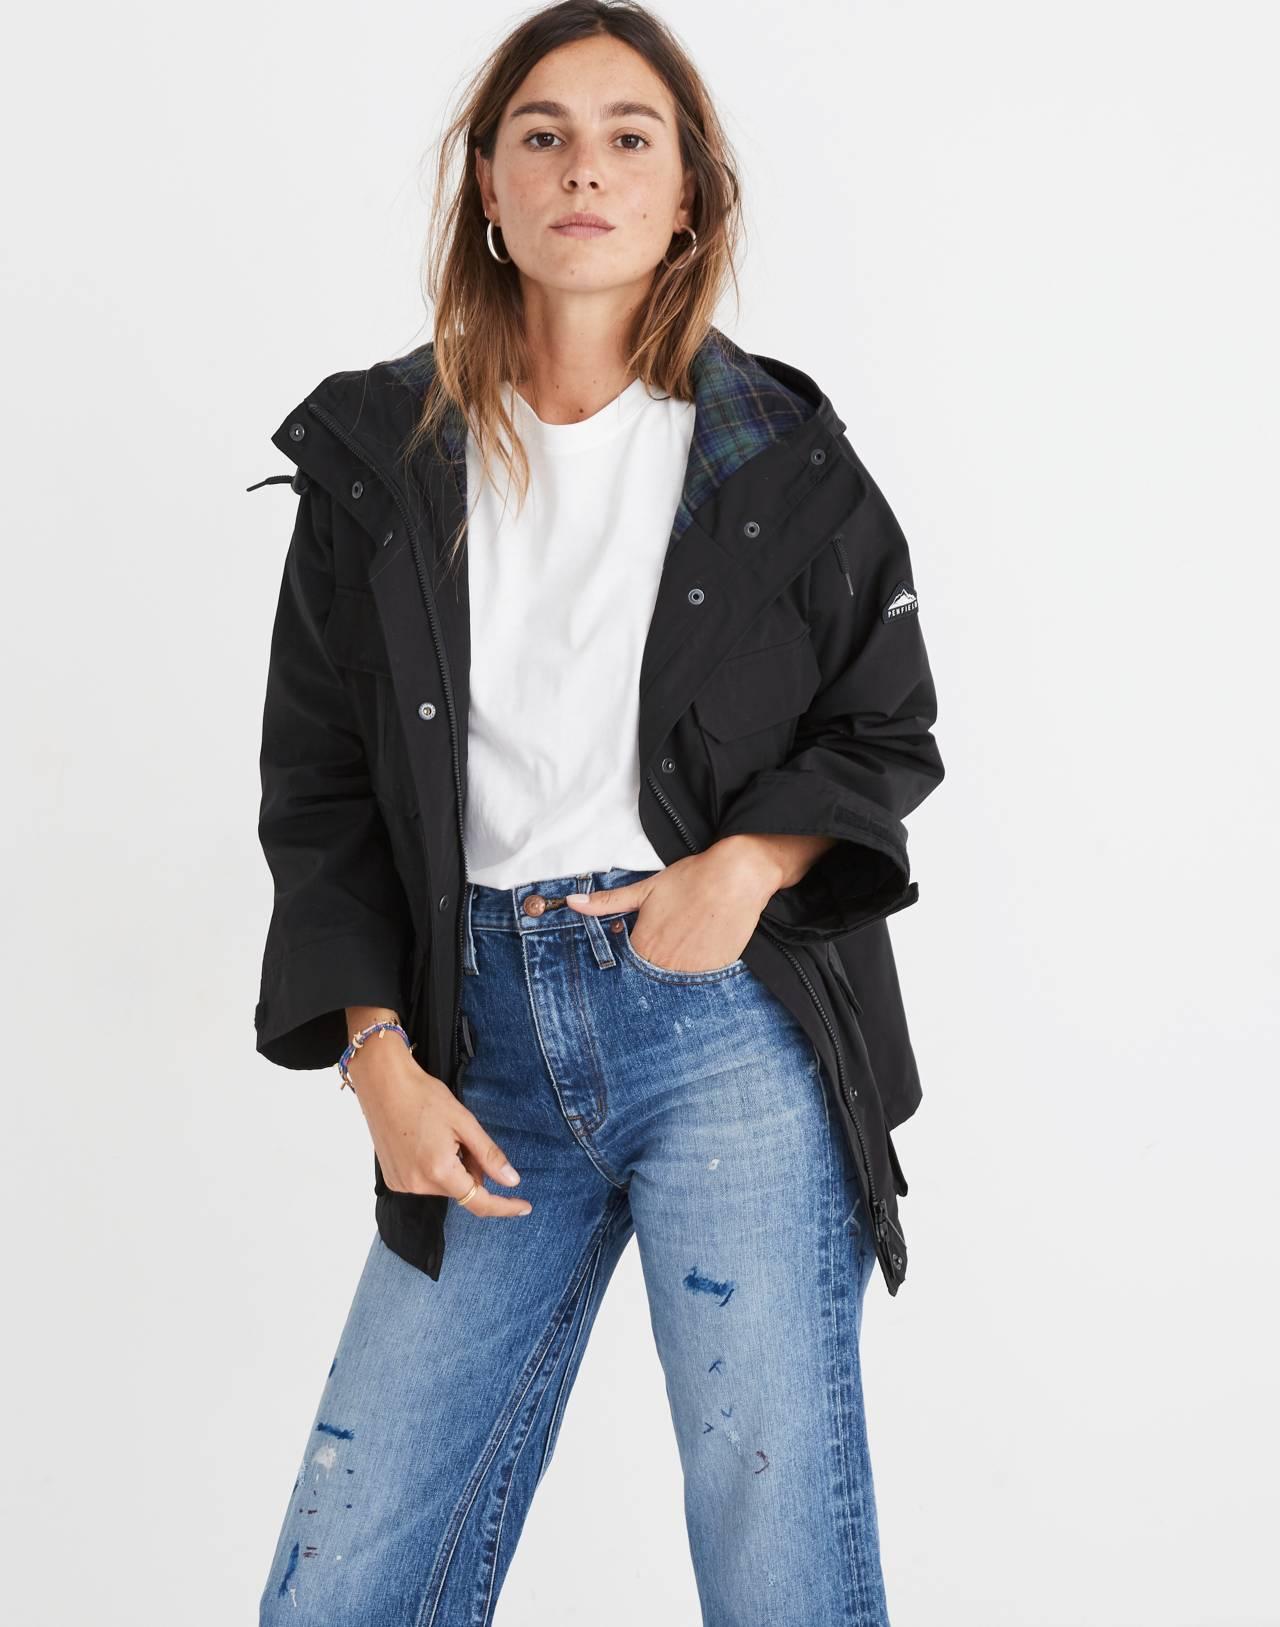 Madewell x Penfield® Medbury Jacket in black image 2